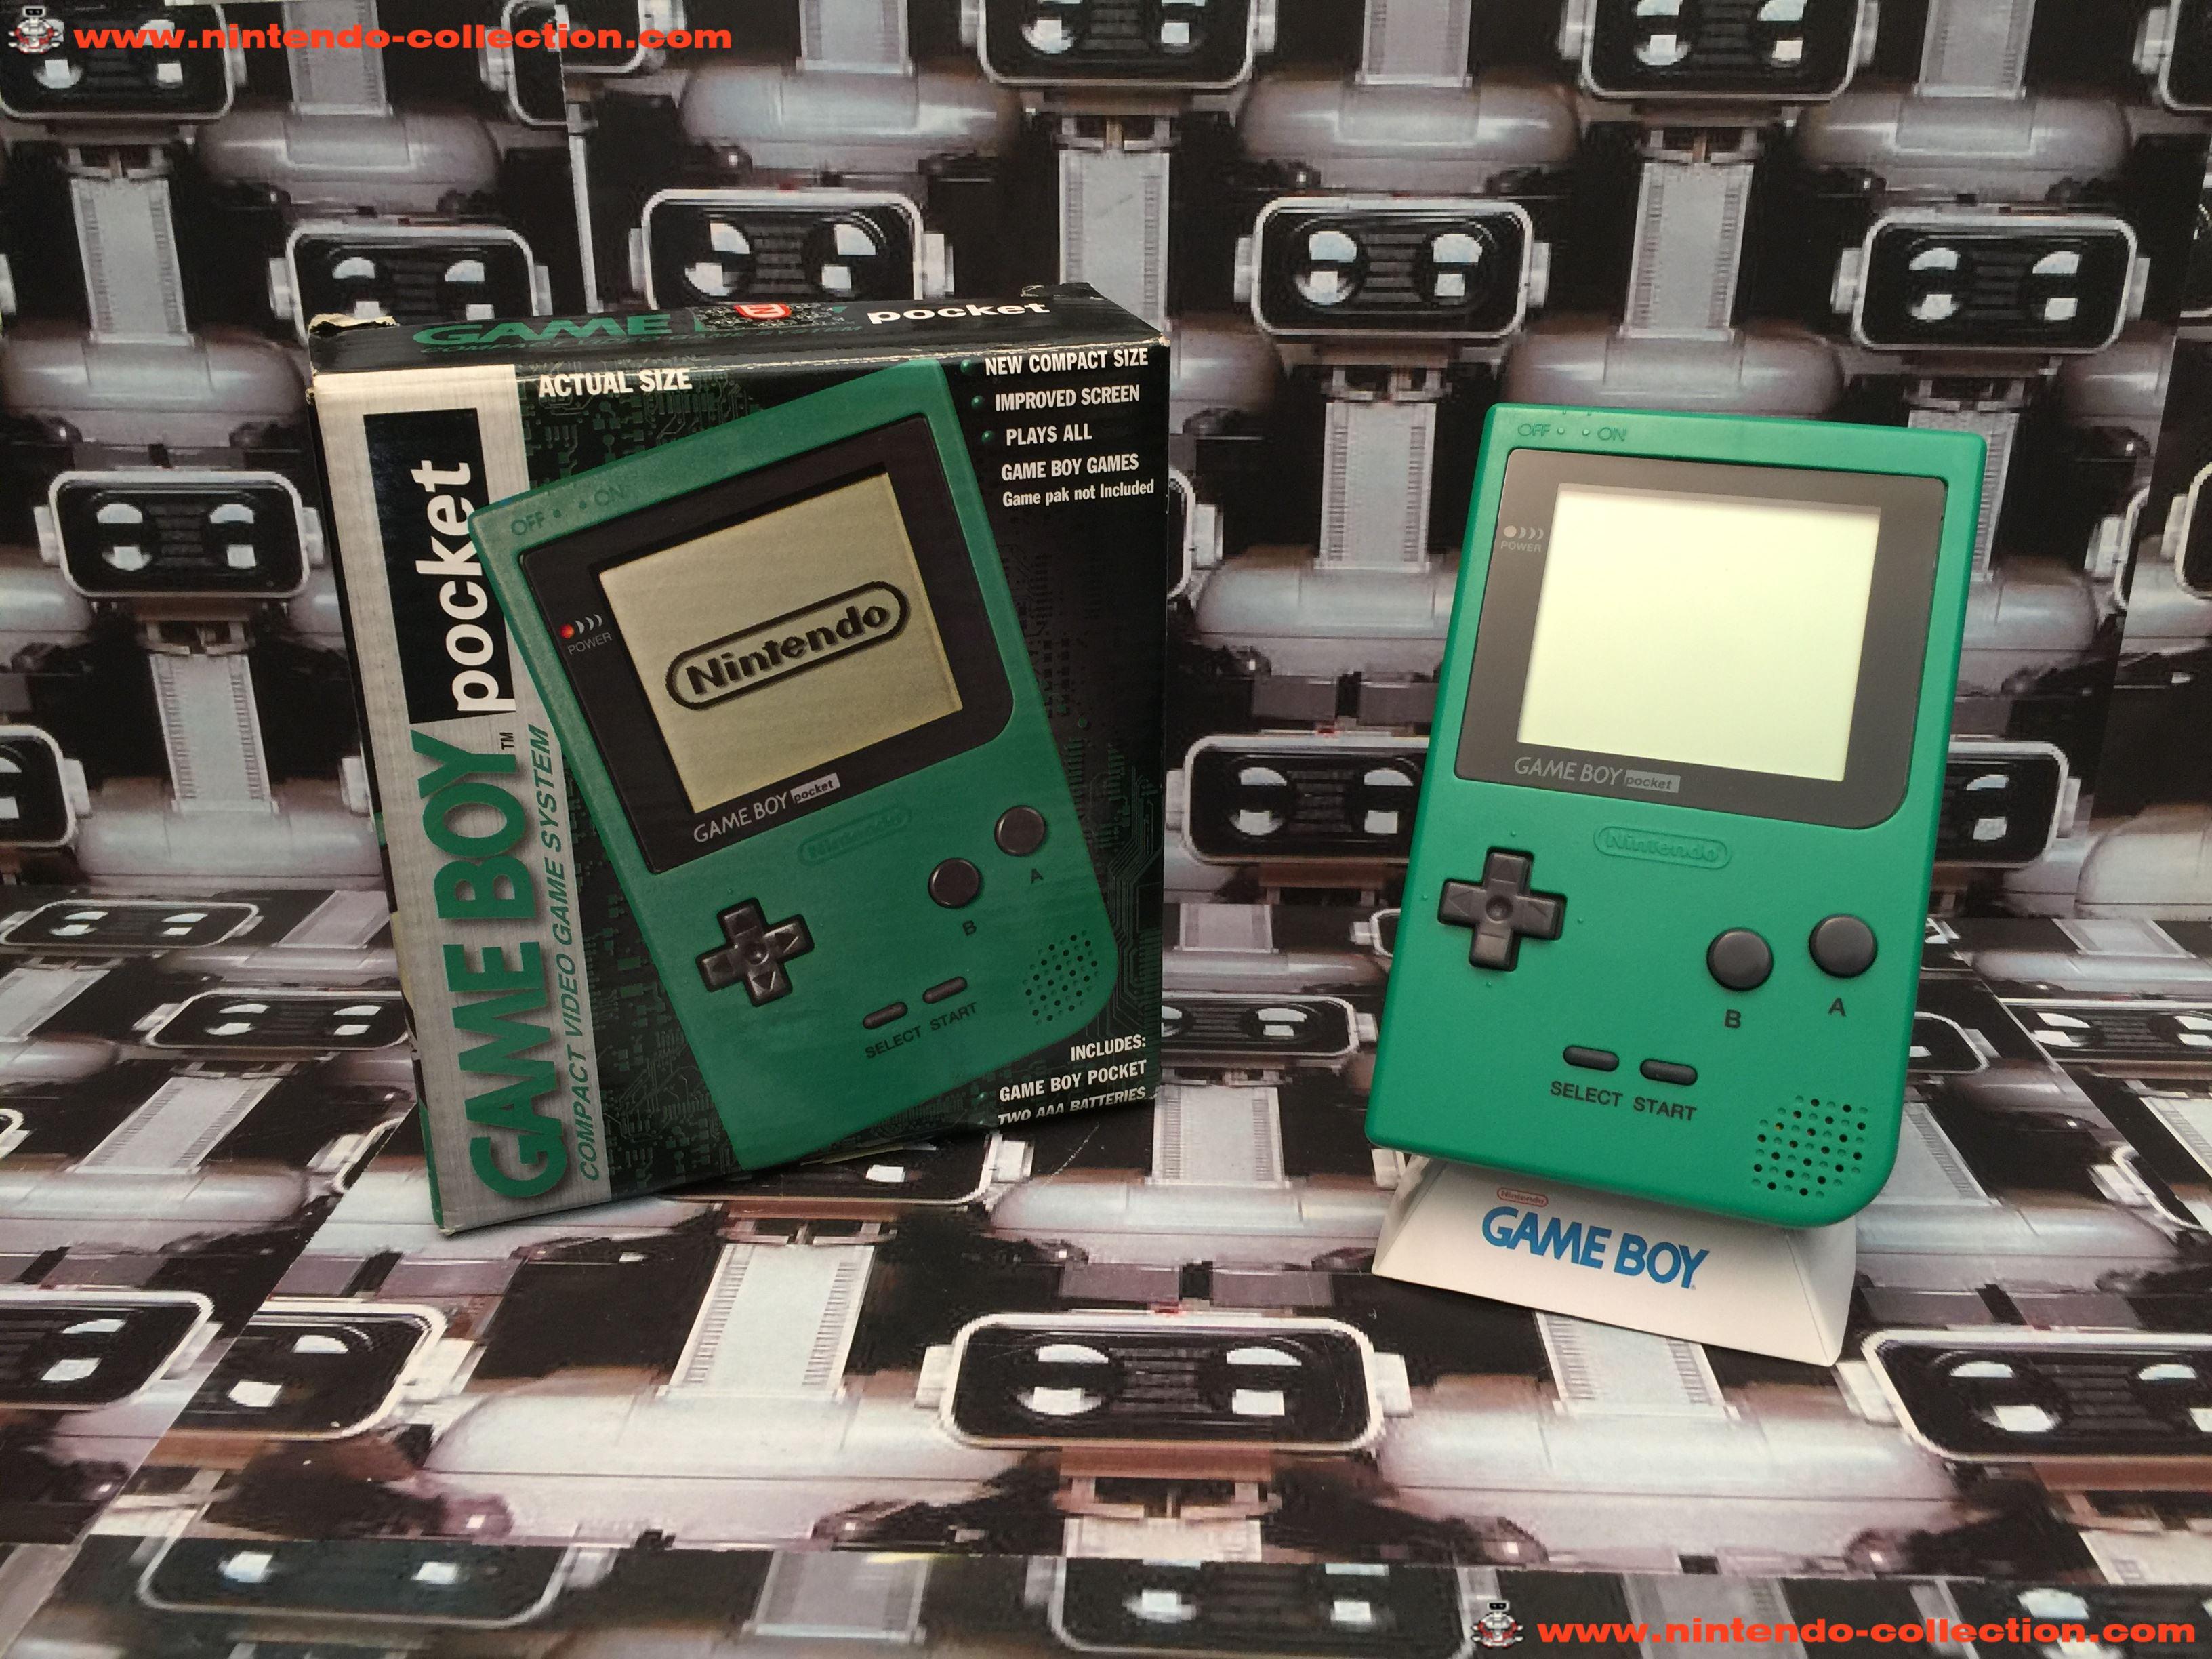 www.nintendo-collection.com - Gameboy GB Pocket Green Verte en boite in box European Europe